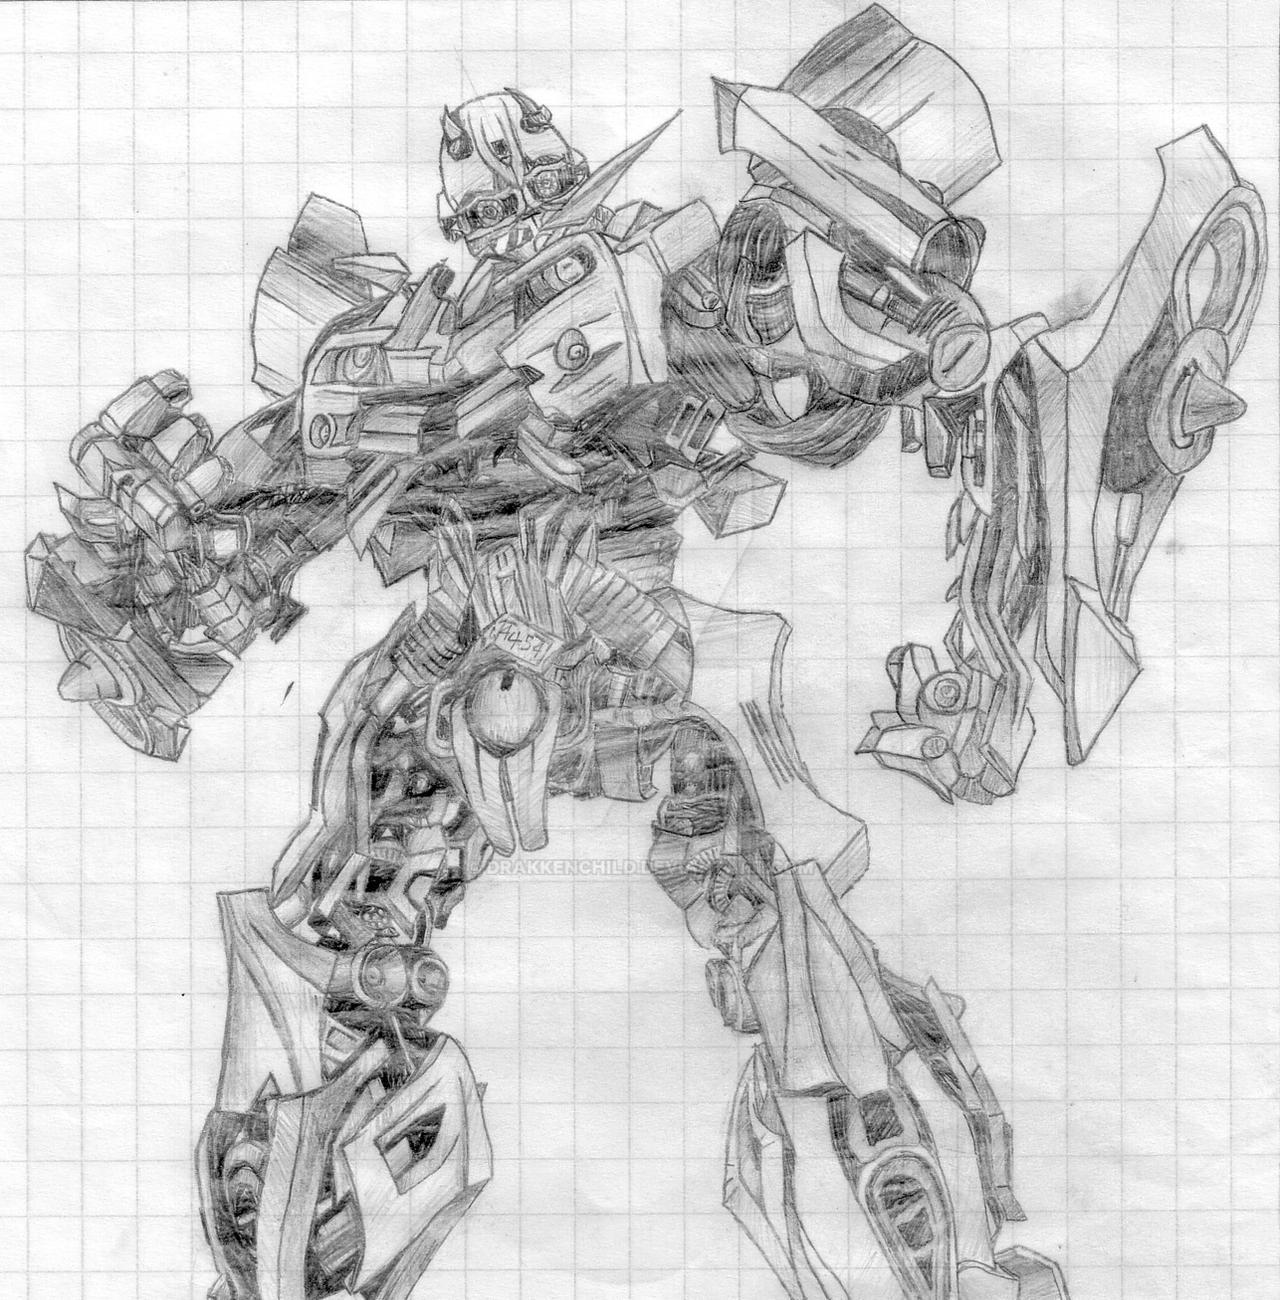 transformers bumblebee sketch by drakkenchild on deviantart